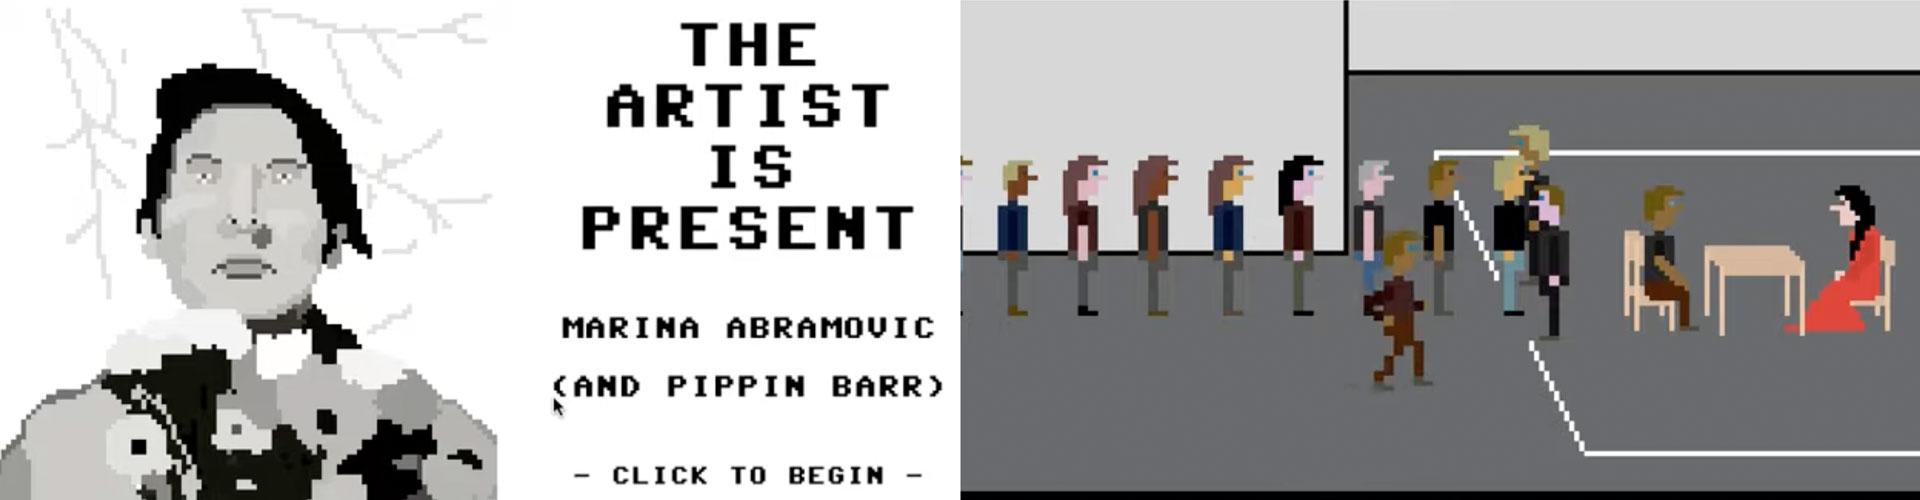 Pippin Barr, The Artist is Present, 2012, Video game (stills)